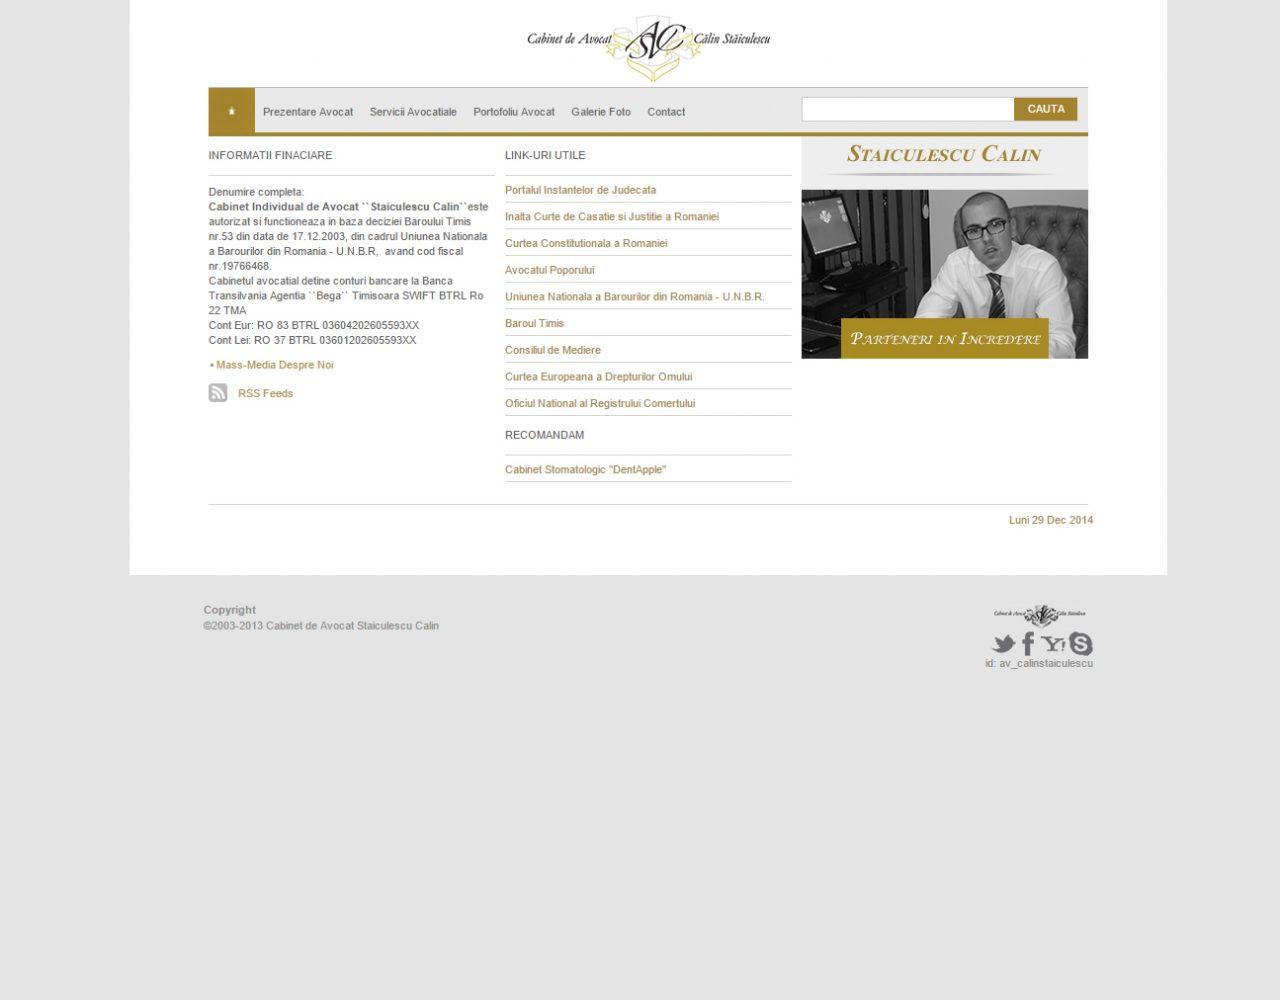 optimizare seo agentie web design timisoara avsc